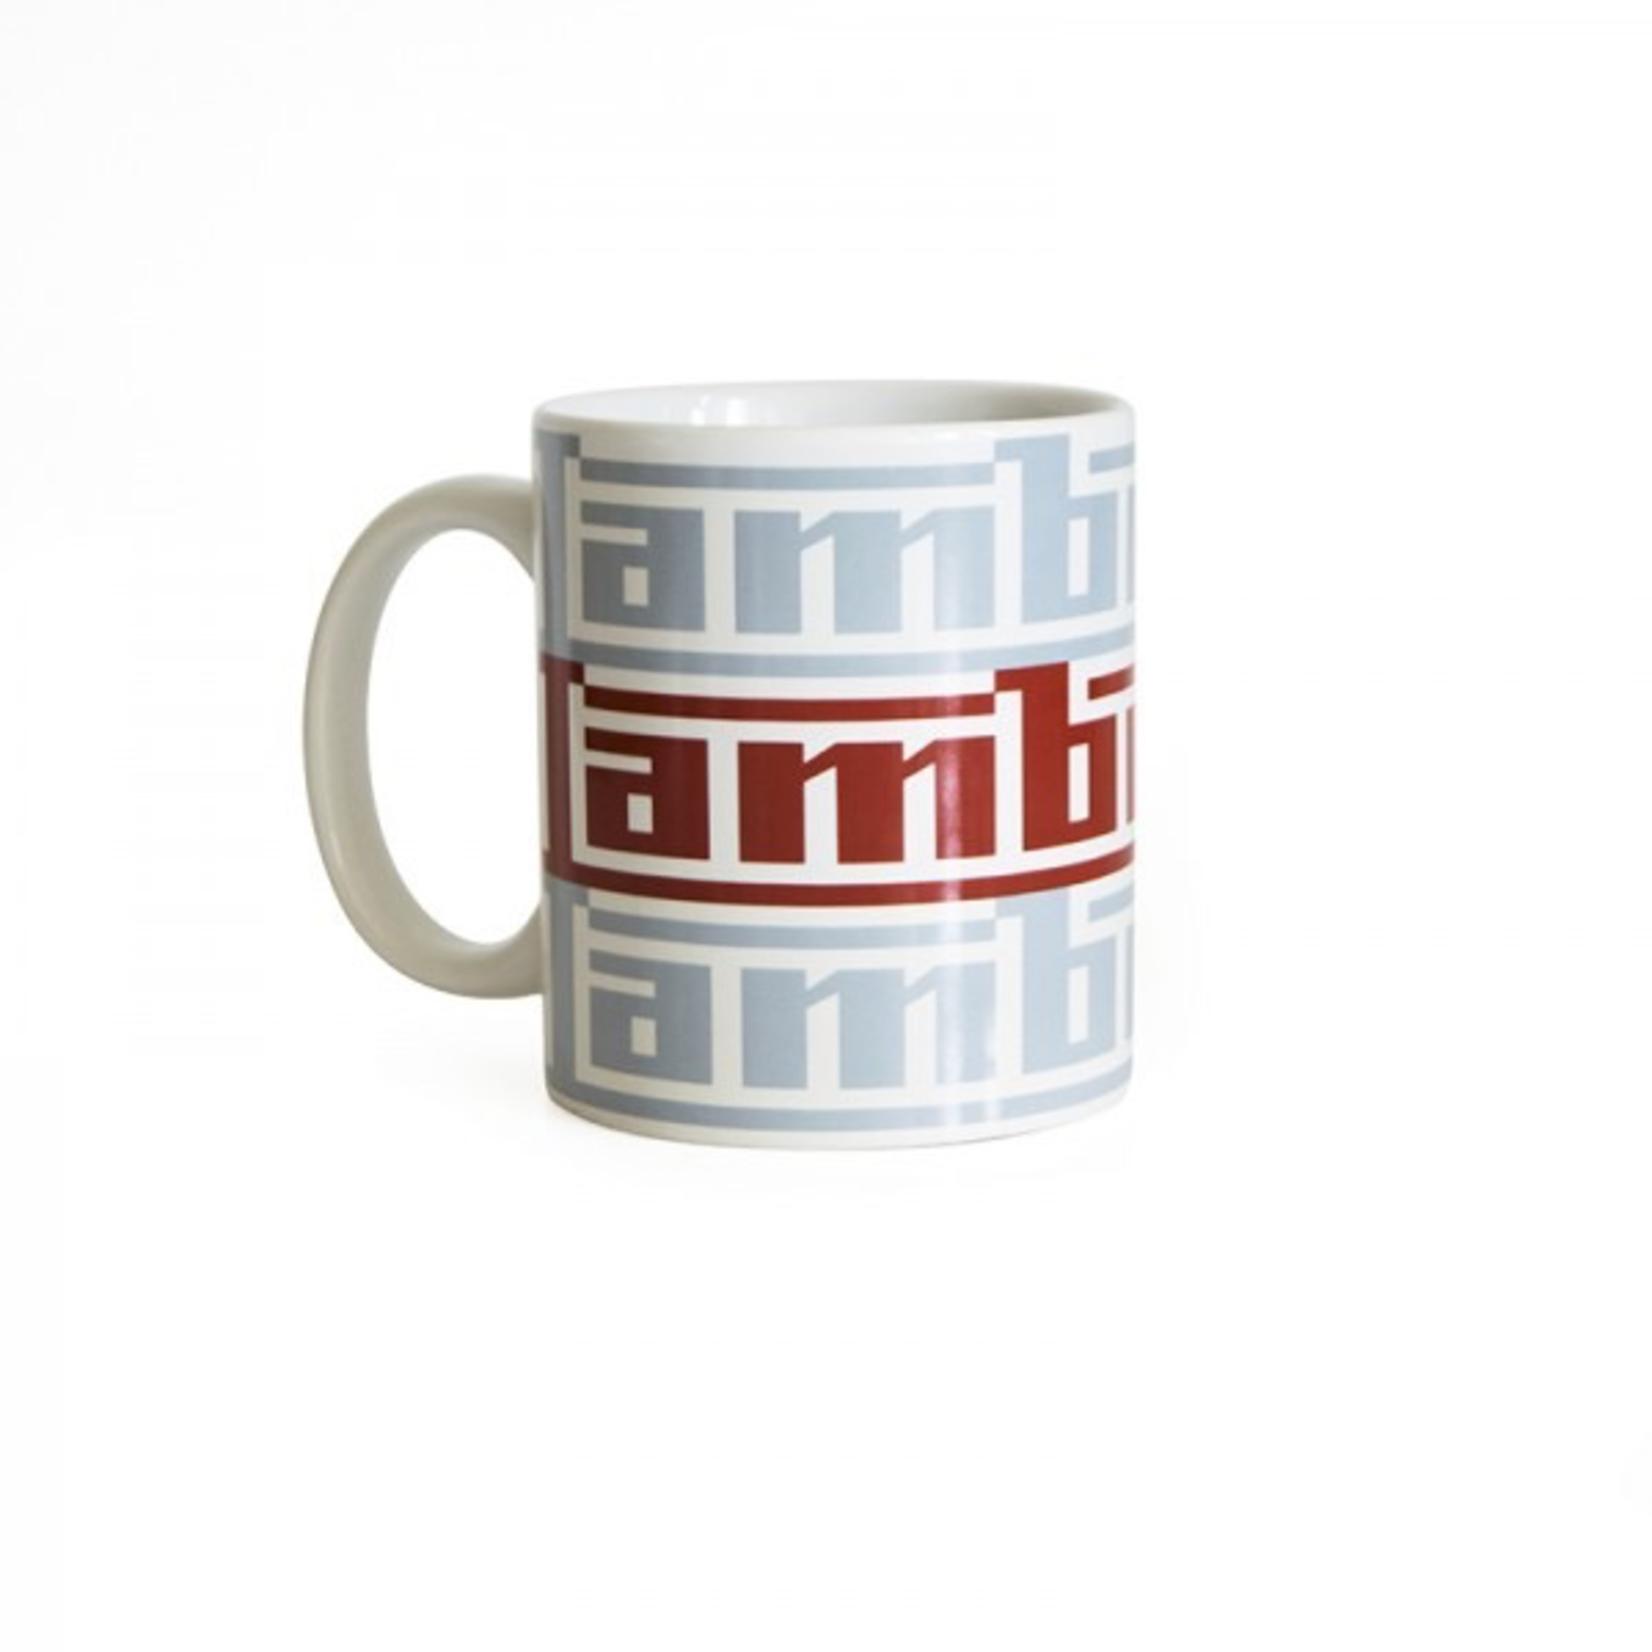 Lifestyle Mug, Lambretta (3 choices)